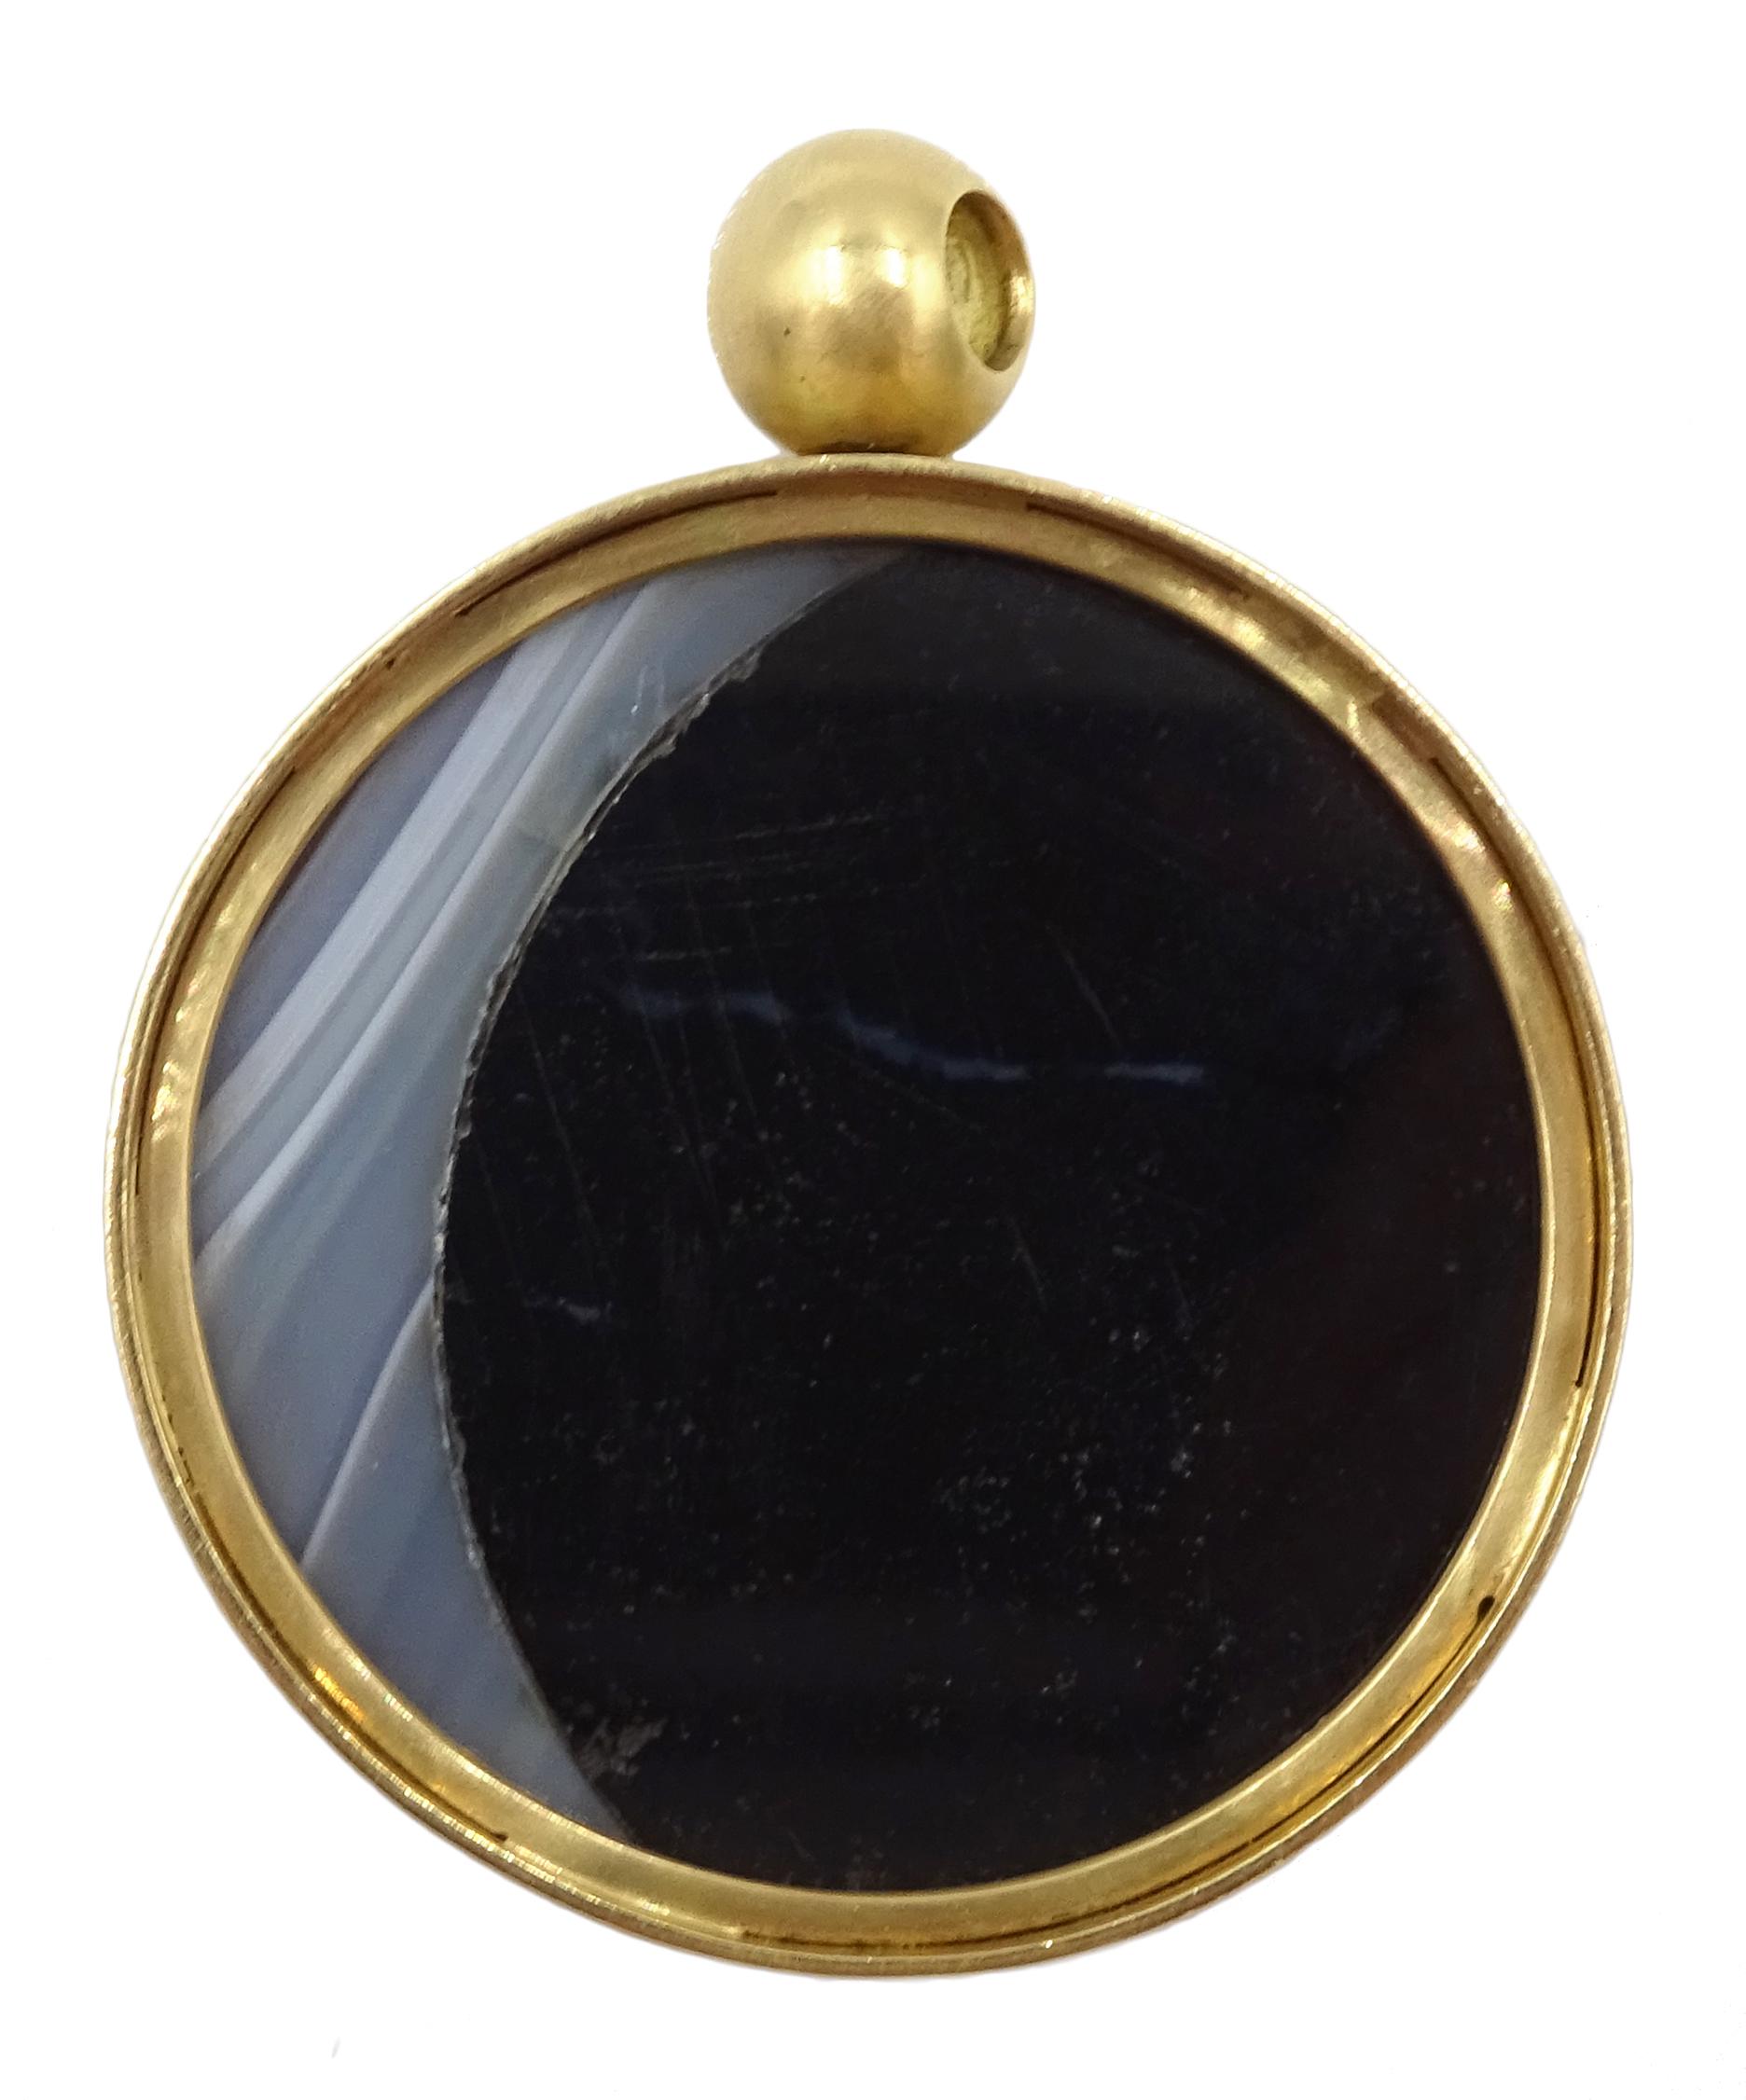 18ct gold swivel pendant - Image 2 of 3